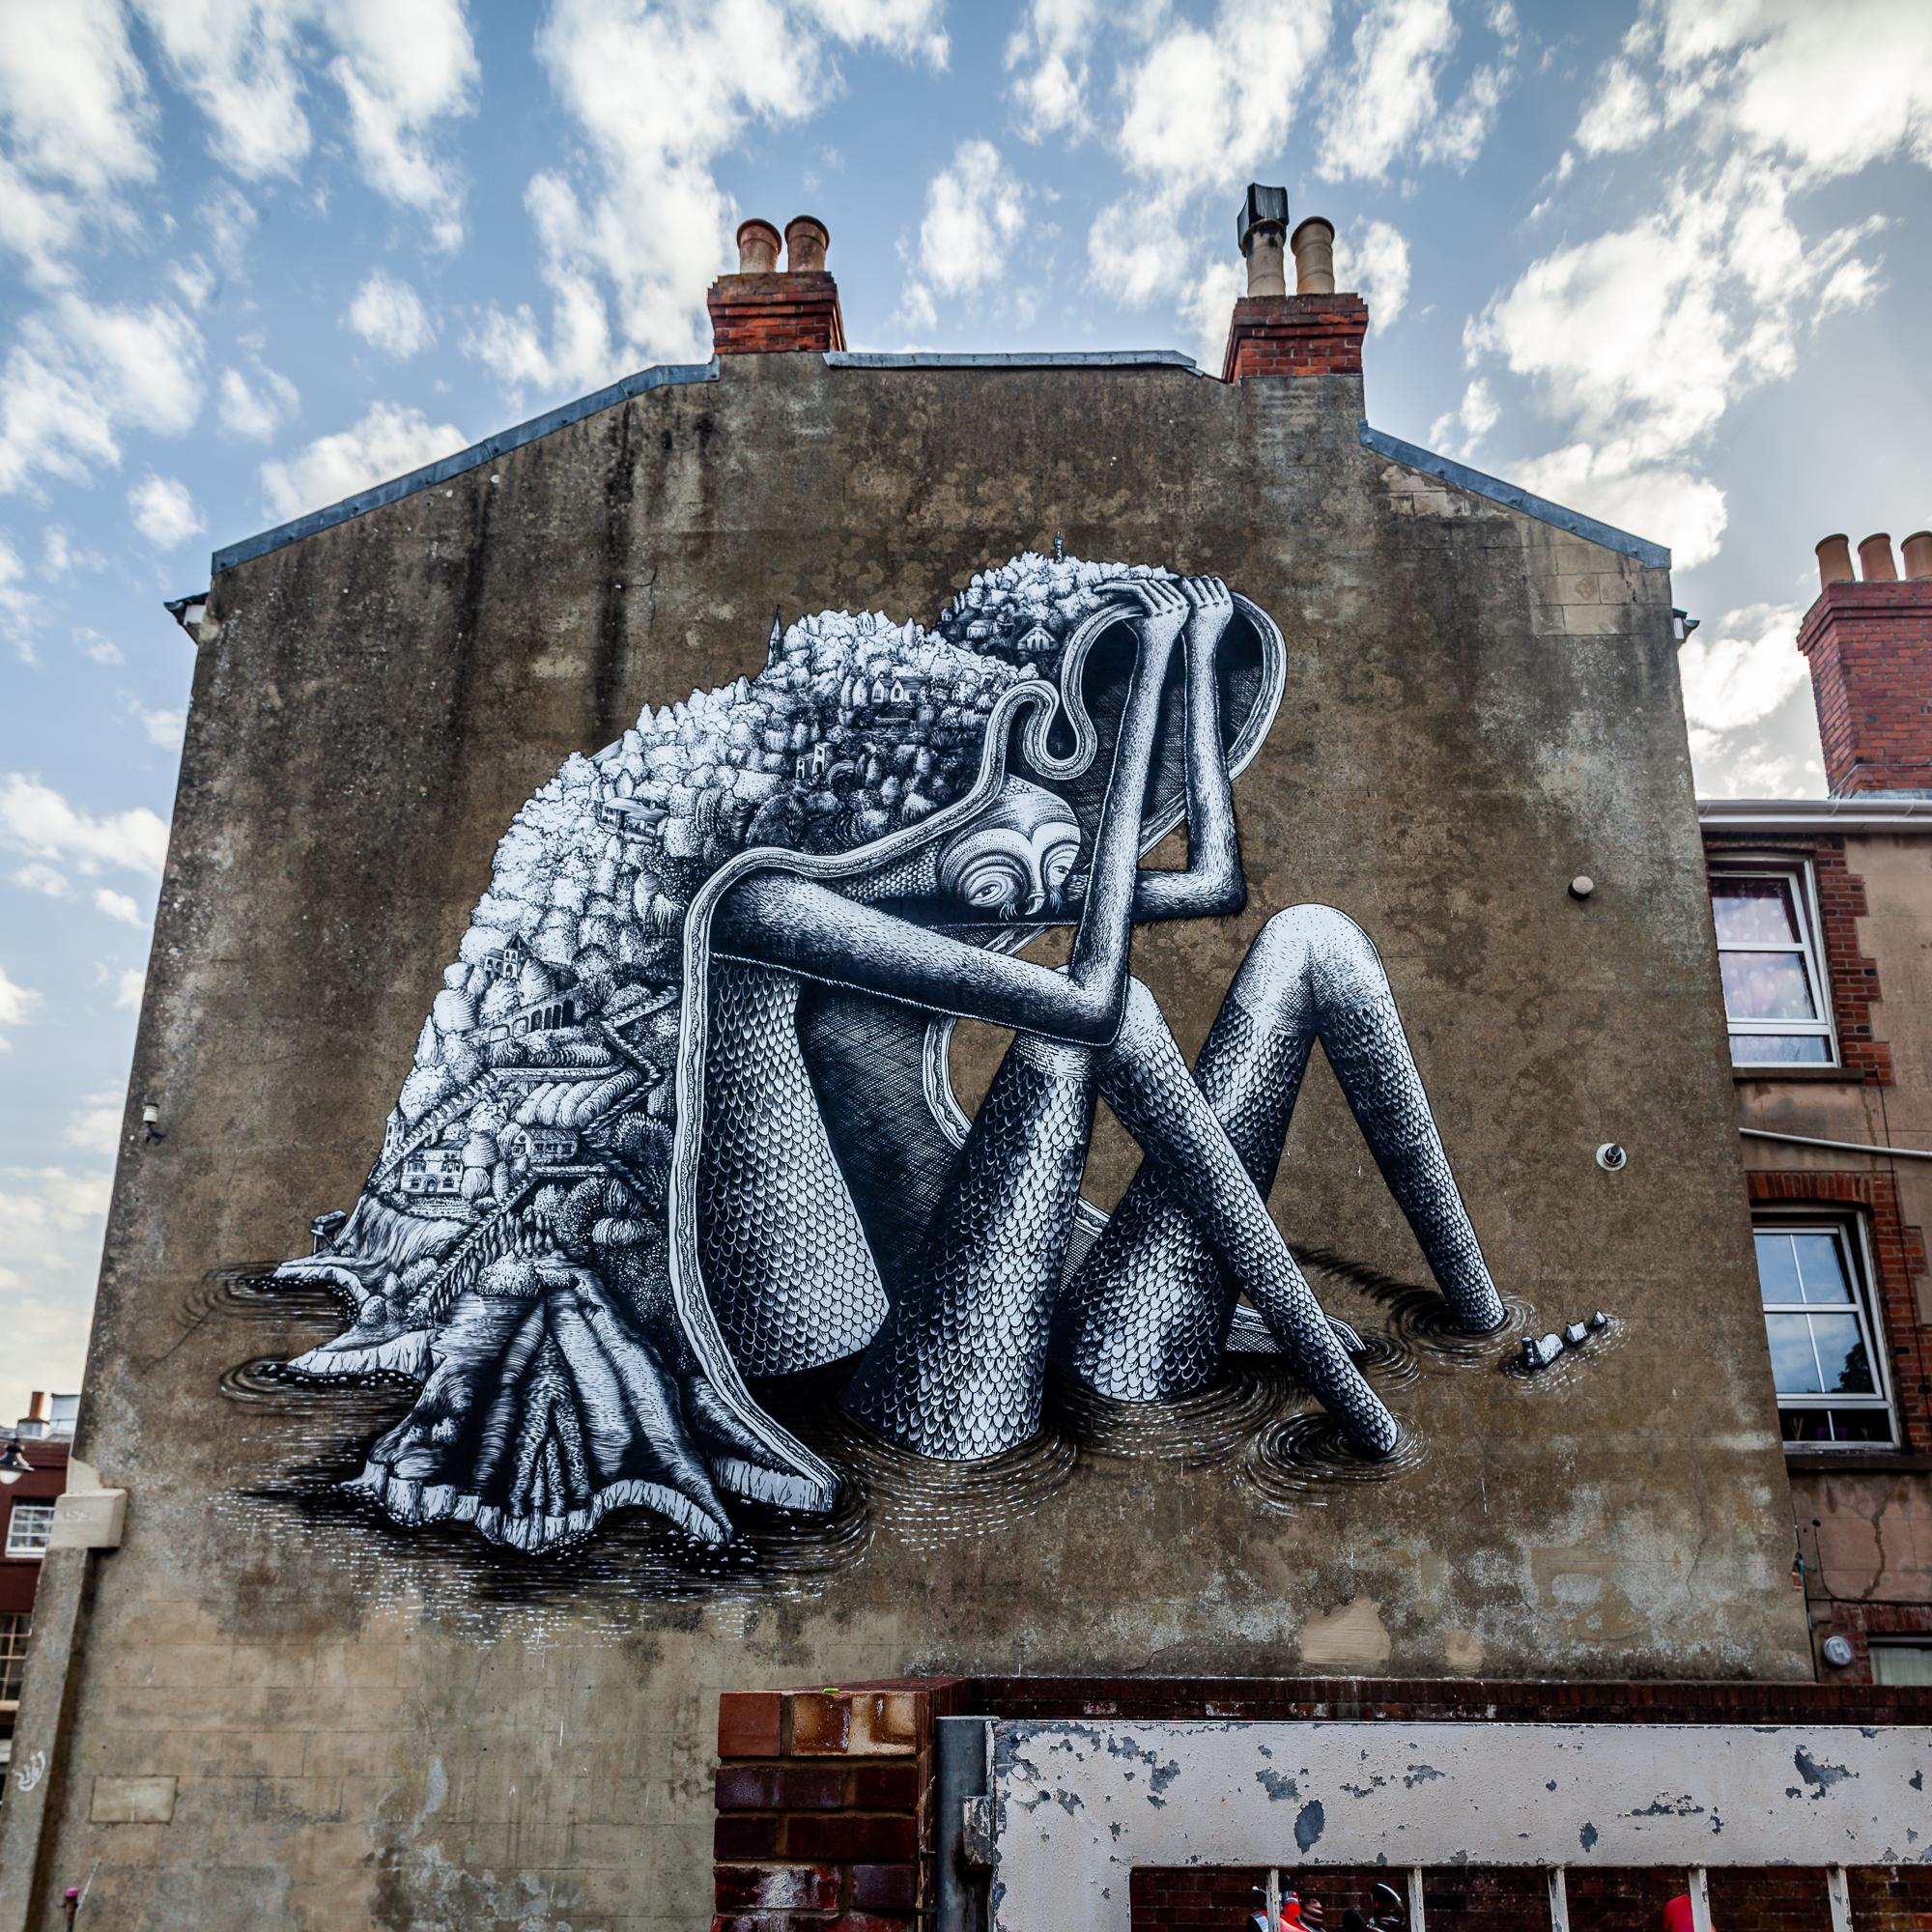 Phlegm Street Art Ventnor Isle of Wight